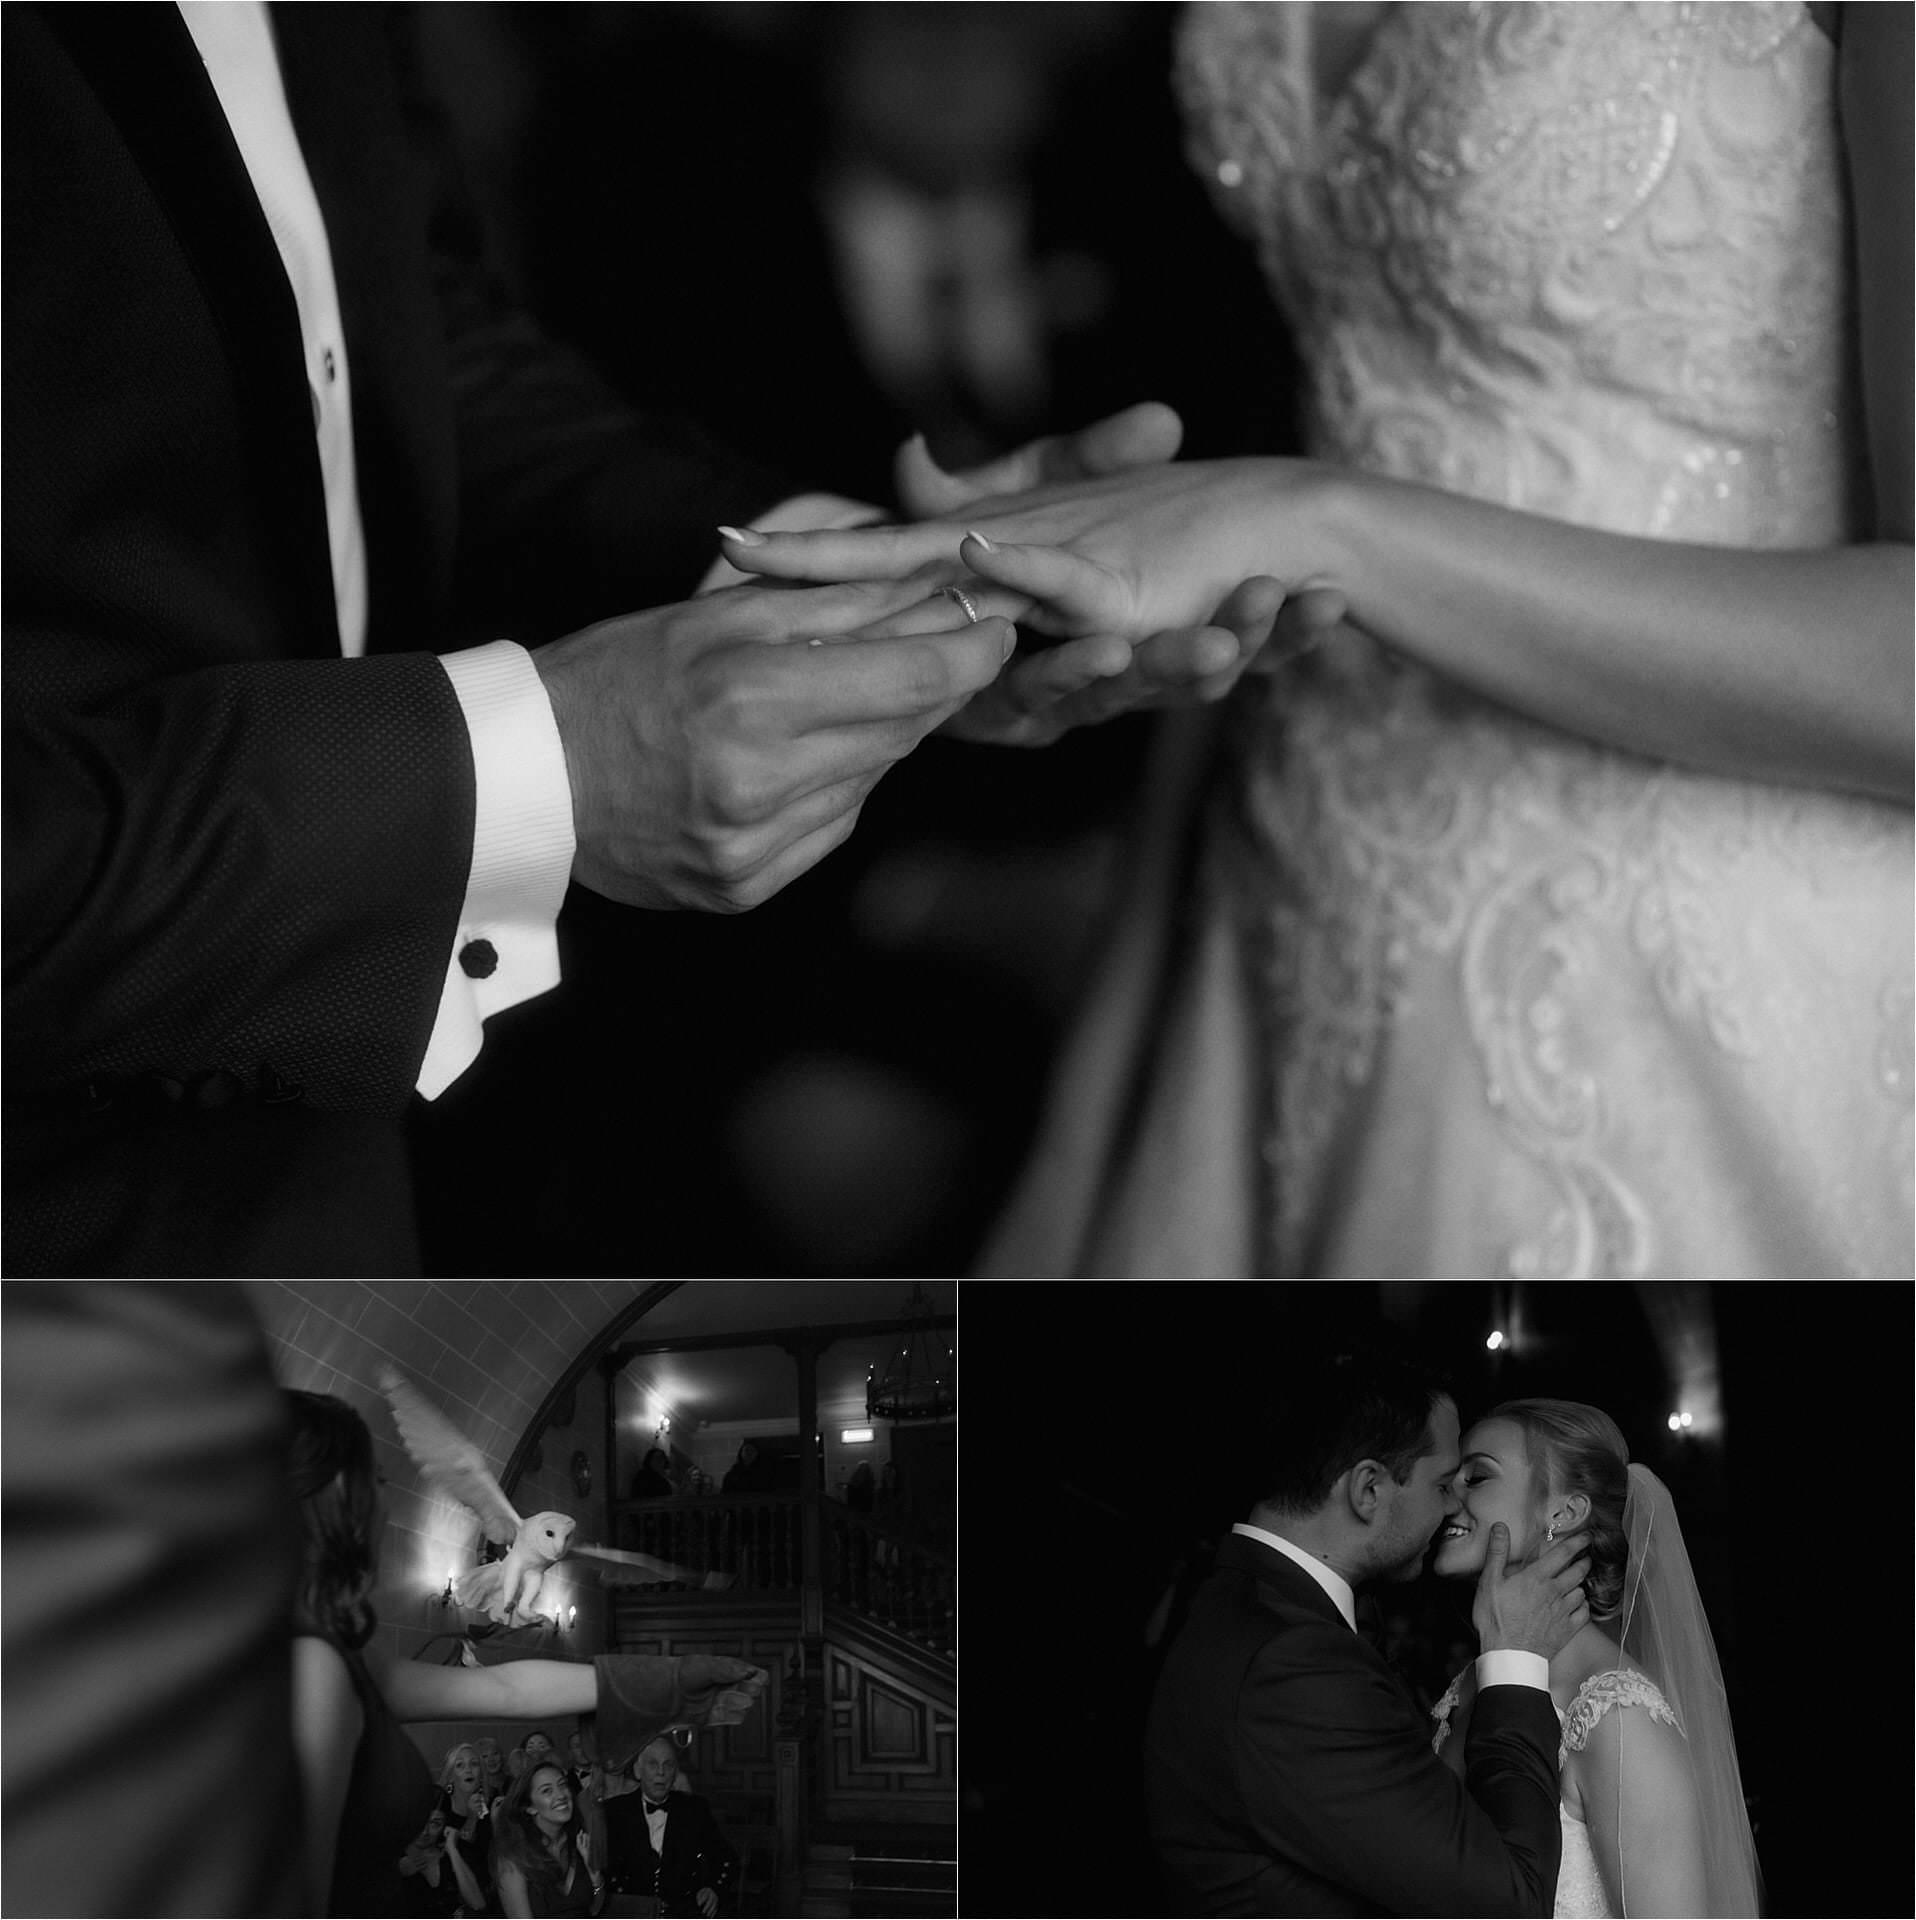 scottish handfasting at a wedding